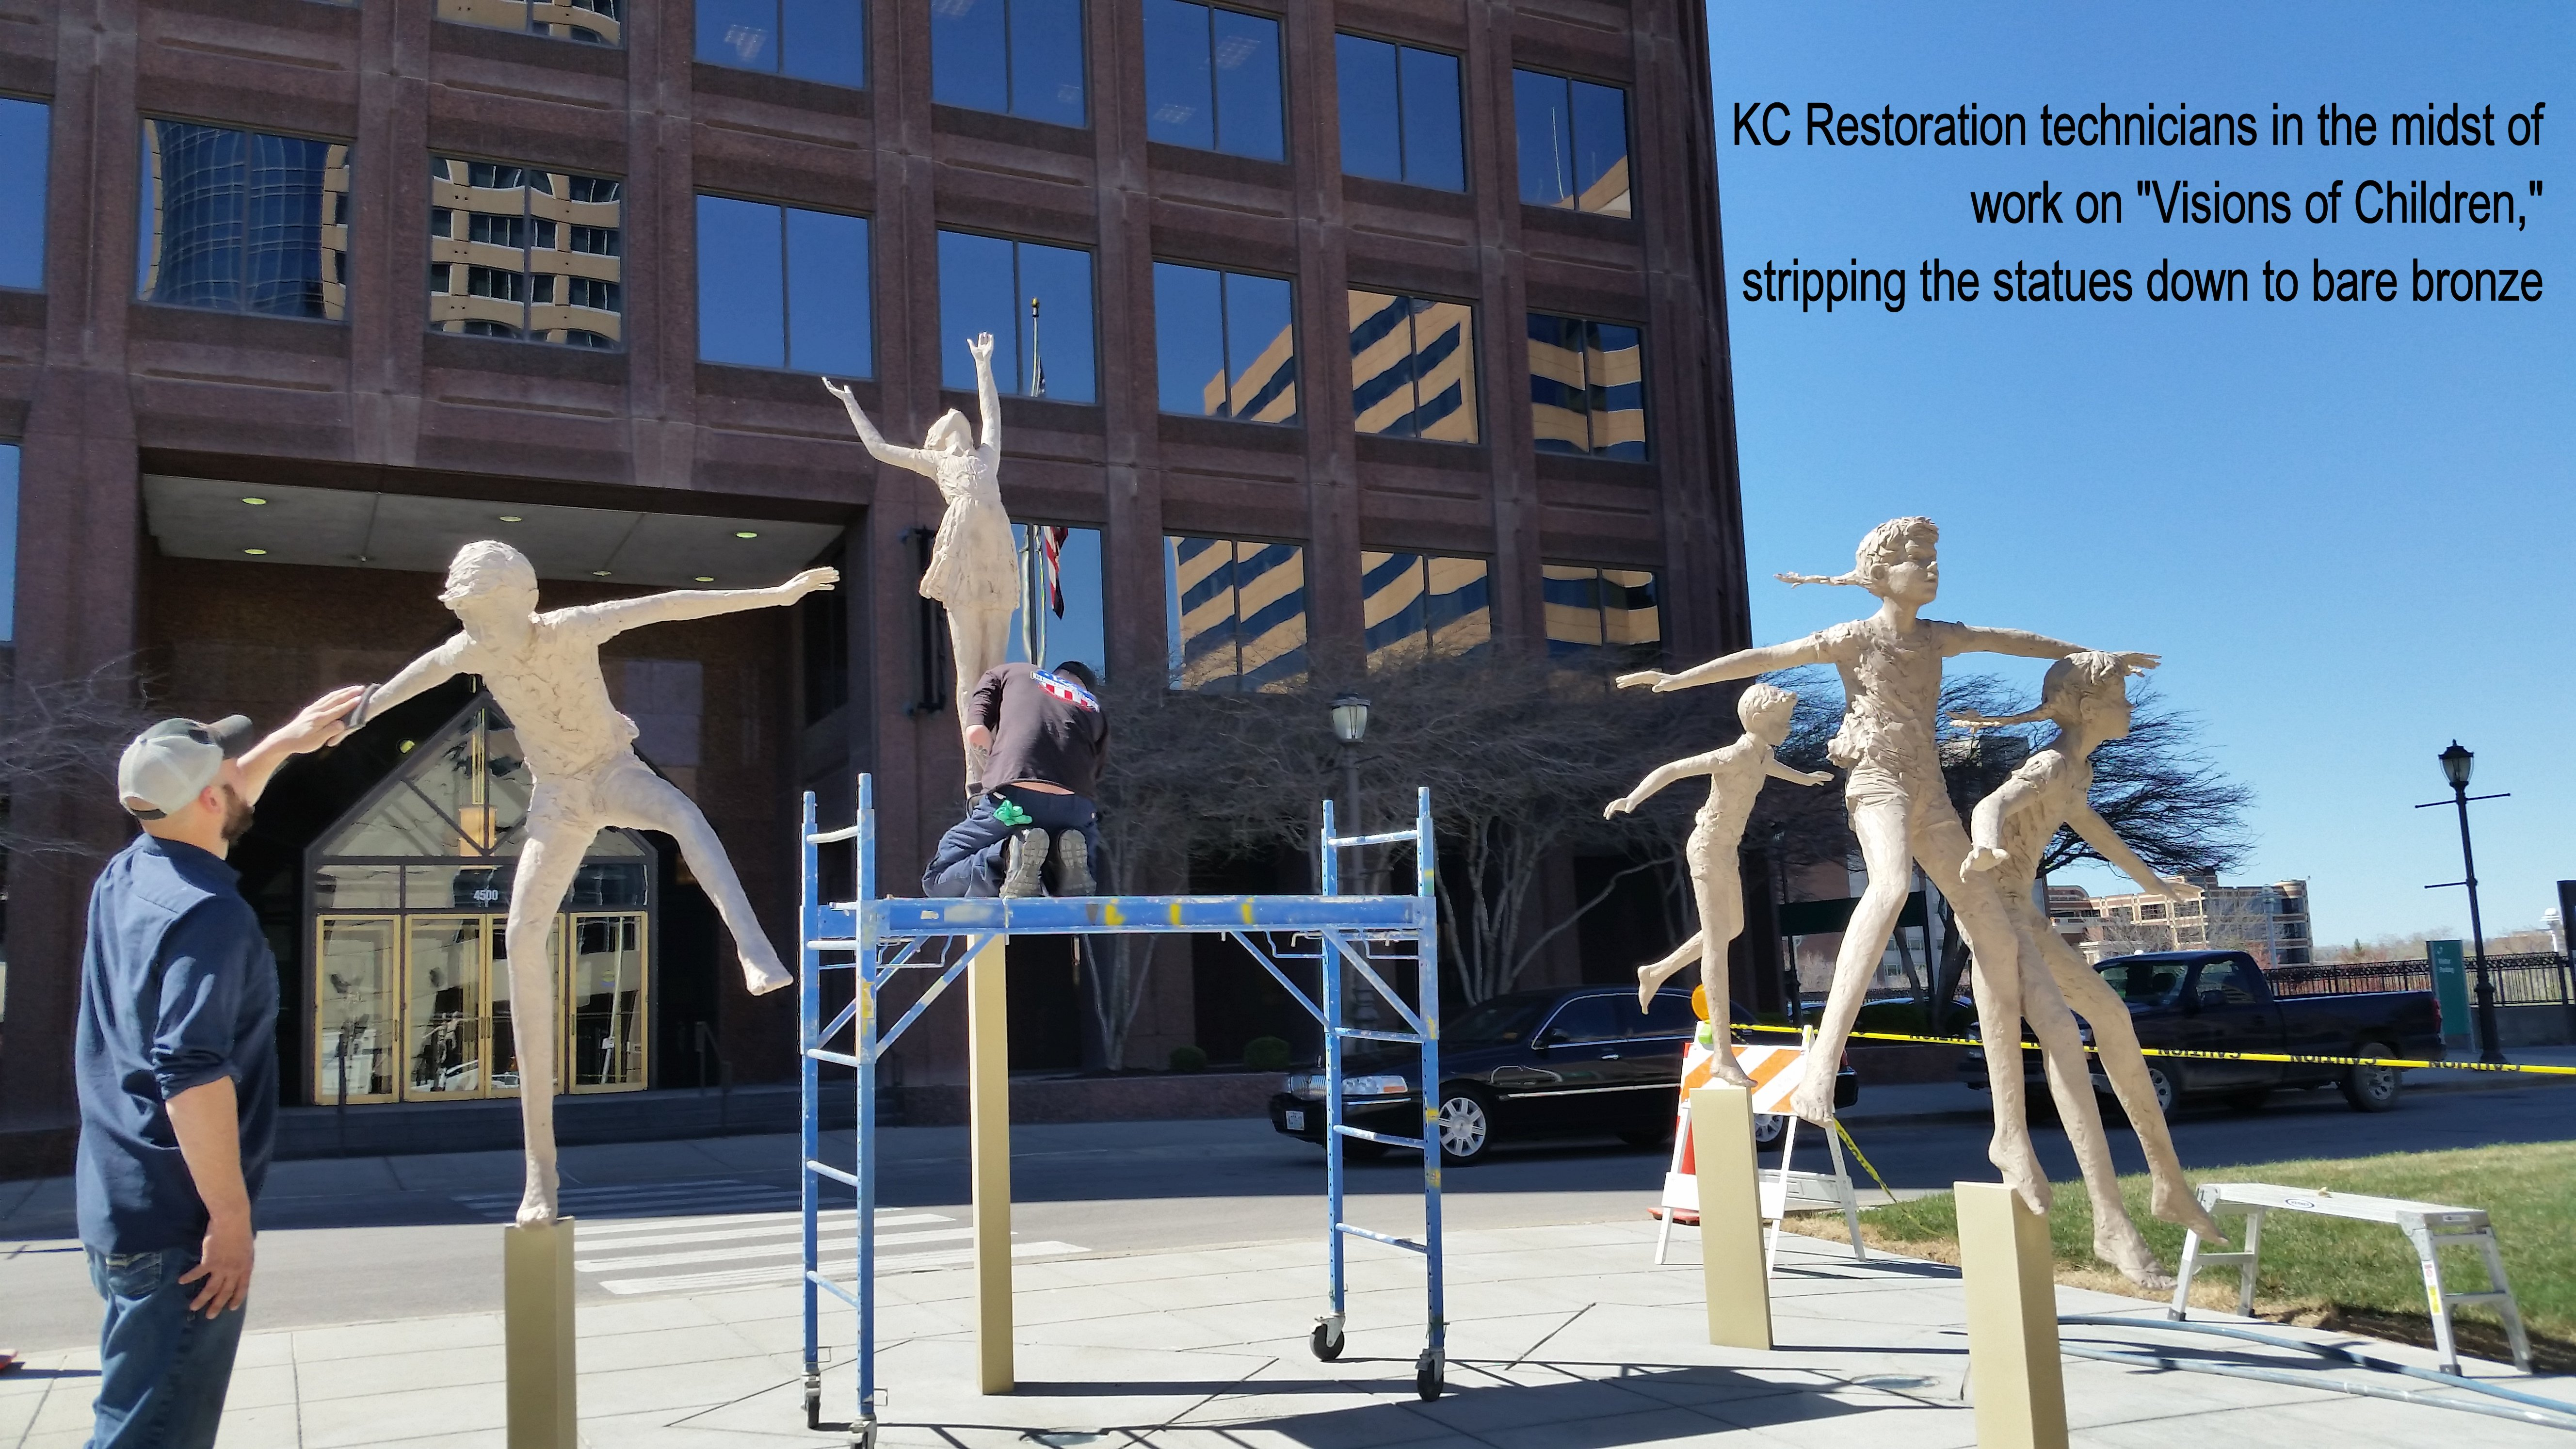 American Century statues